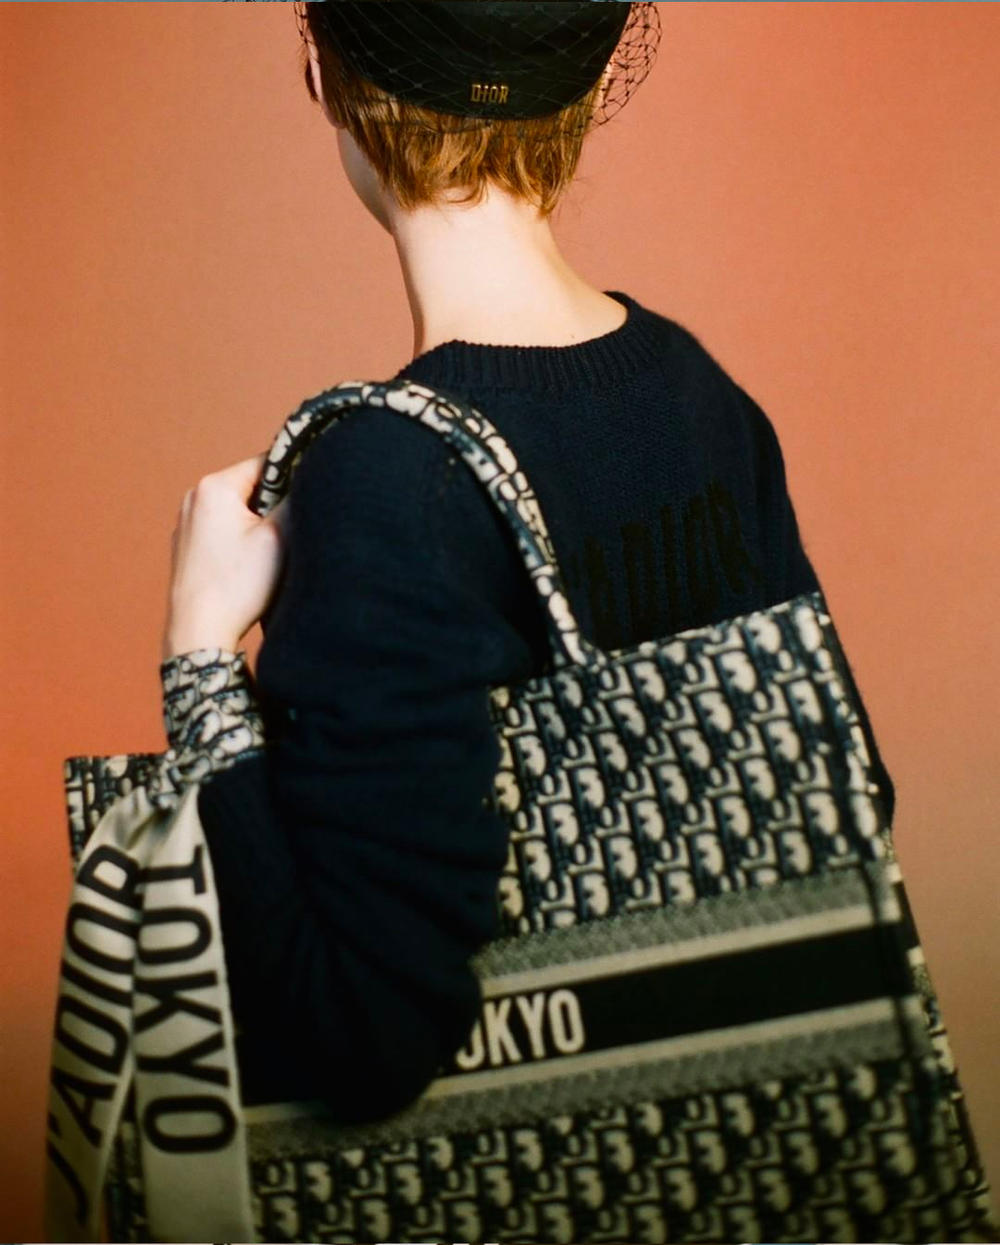 Kiko Mizuhara Christian Dior Tokyo Exclusive Campaign Beret Hat Logo Bag